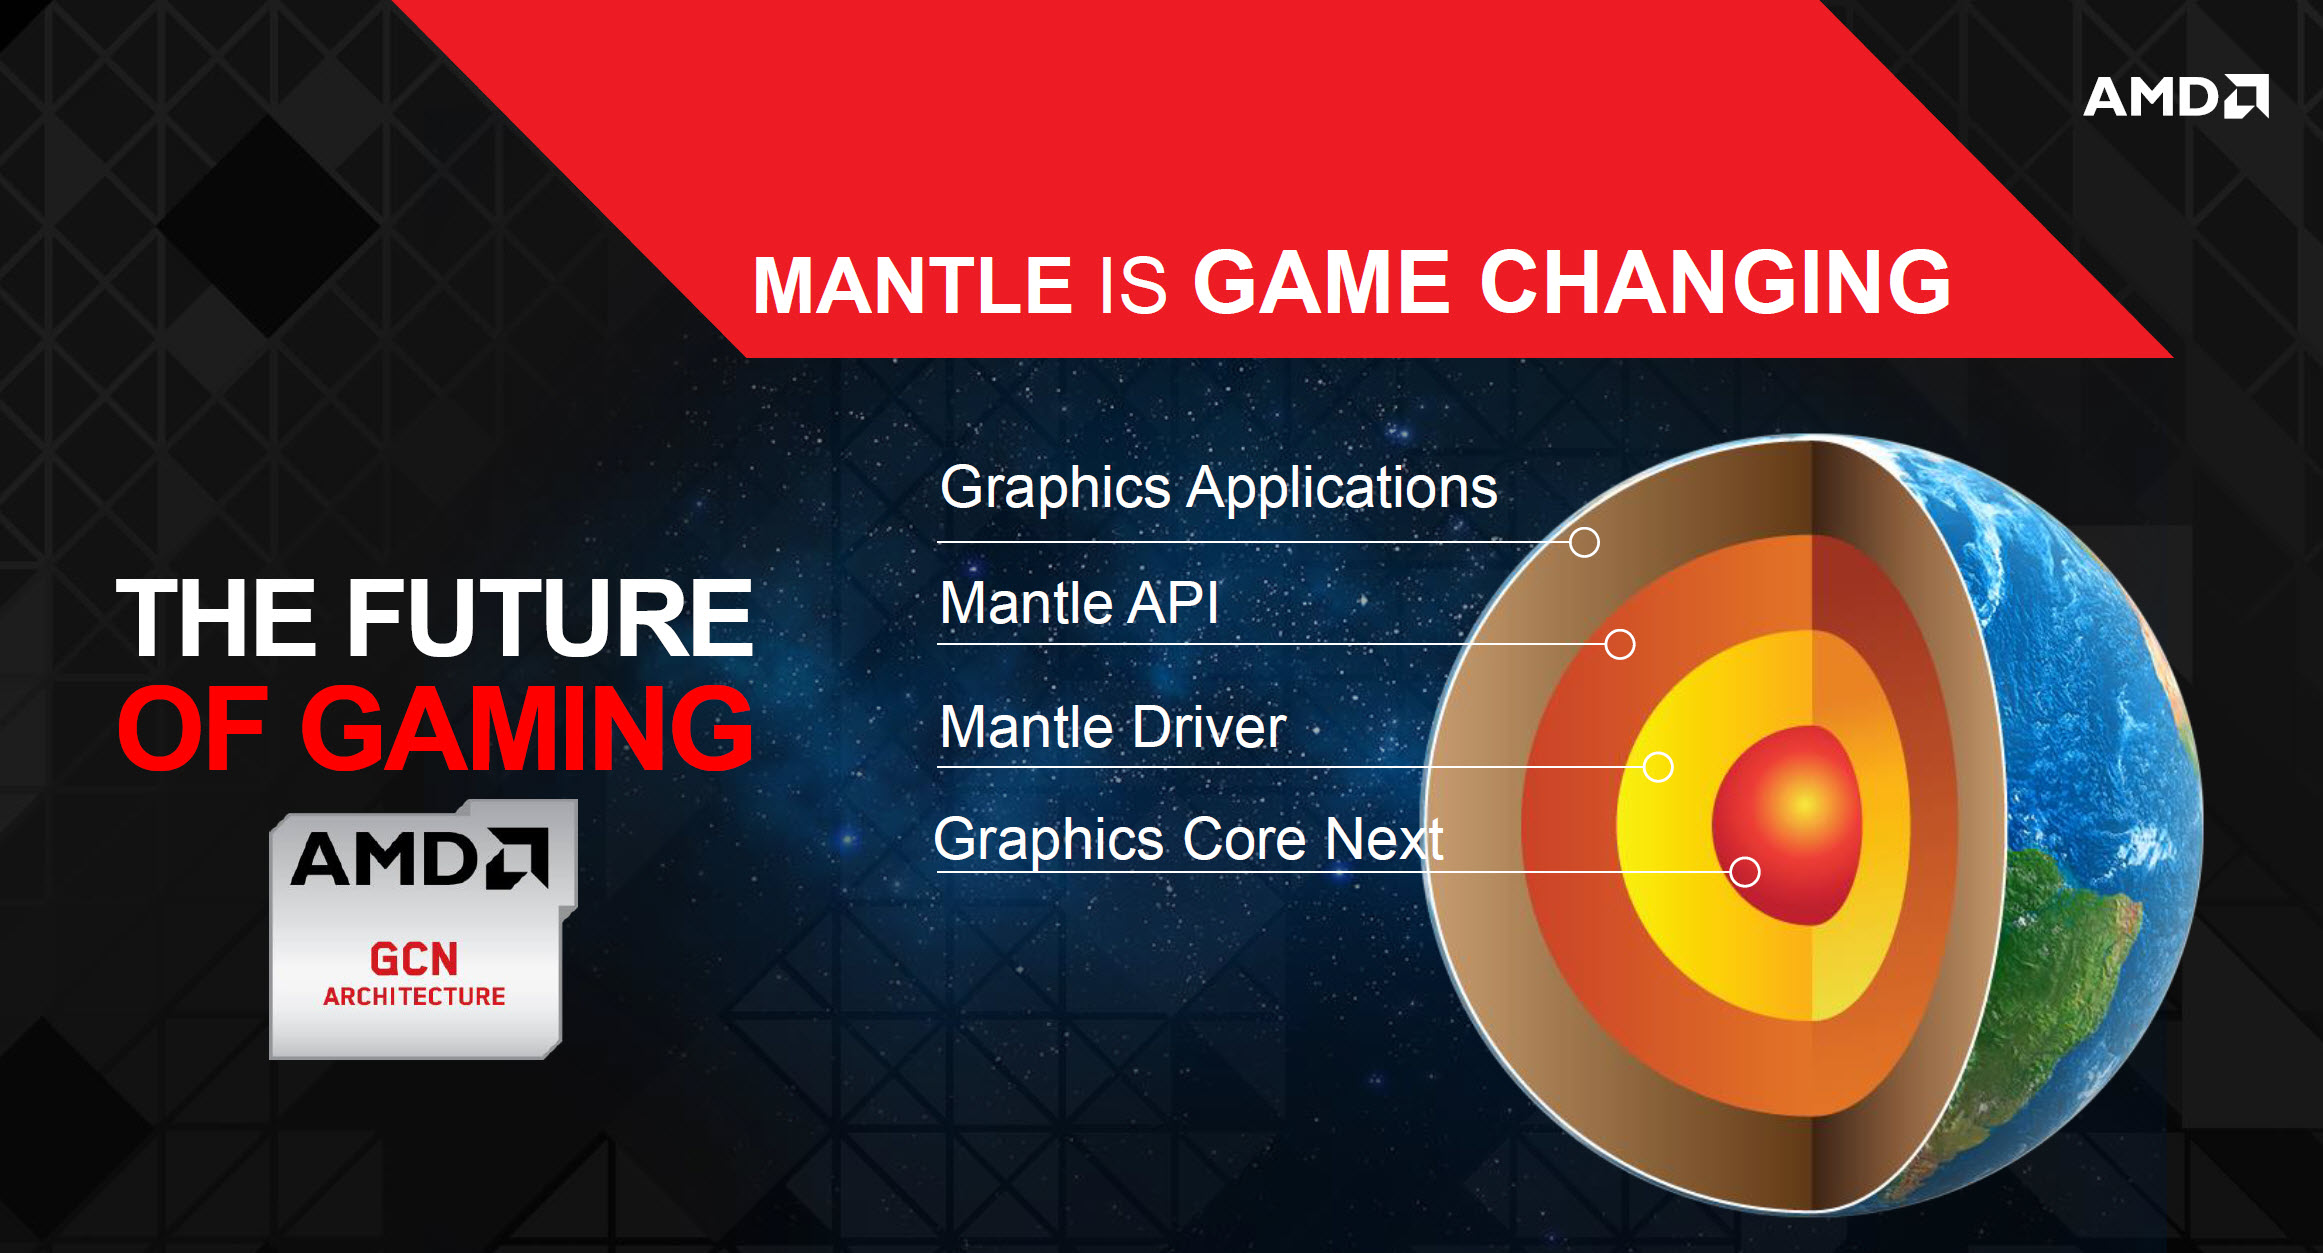 AMD Mantle API Performance Analysis With Radeon R7 260X, R9